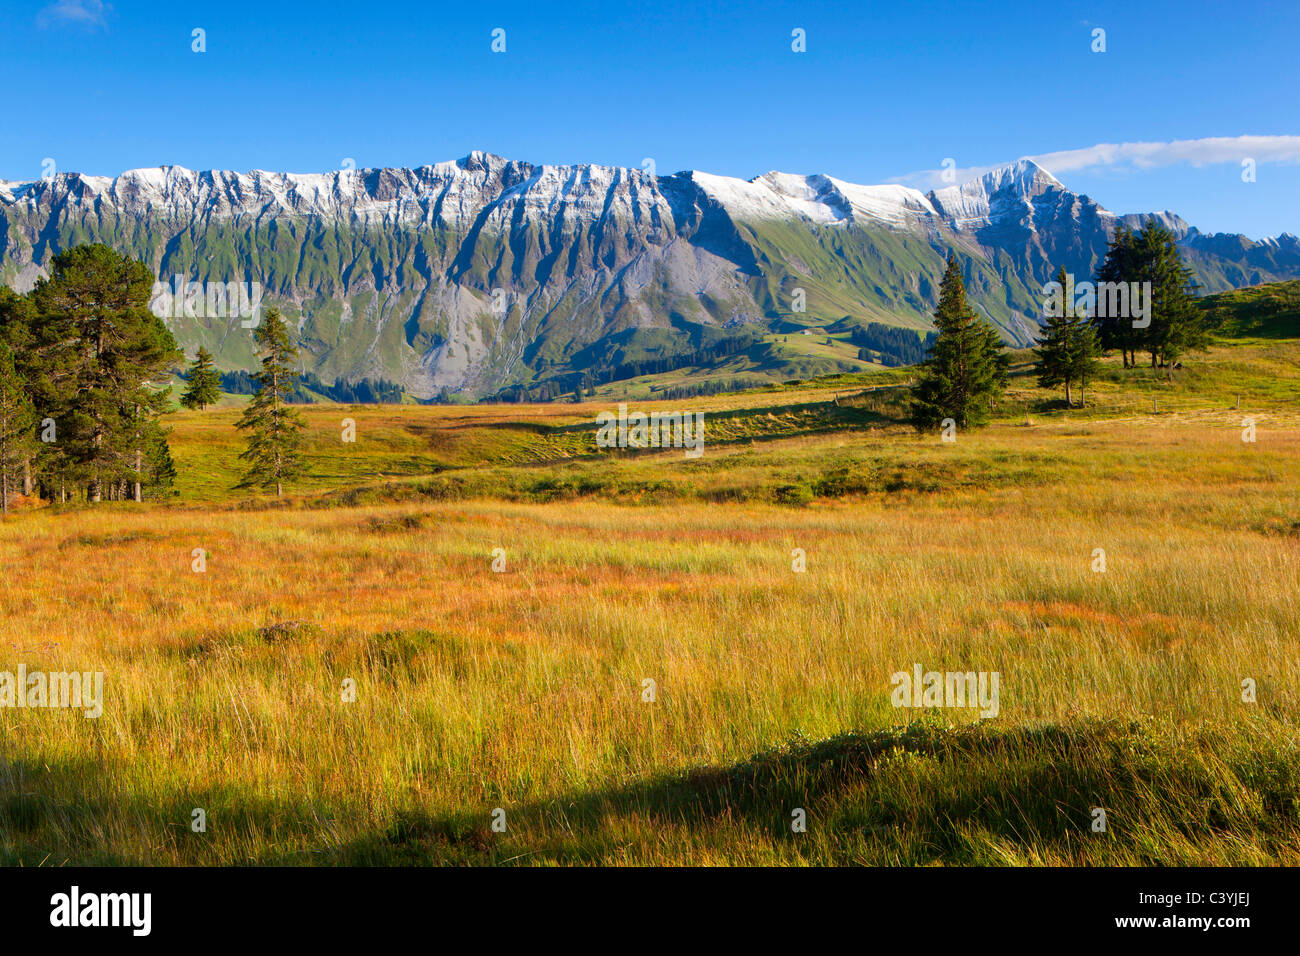 Sorenberg, Switzerland, canton Lucerne, biosphere reserve Entlebuch, high-level moor, trees, mountains, mountain - Stock Image